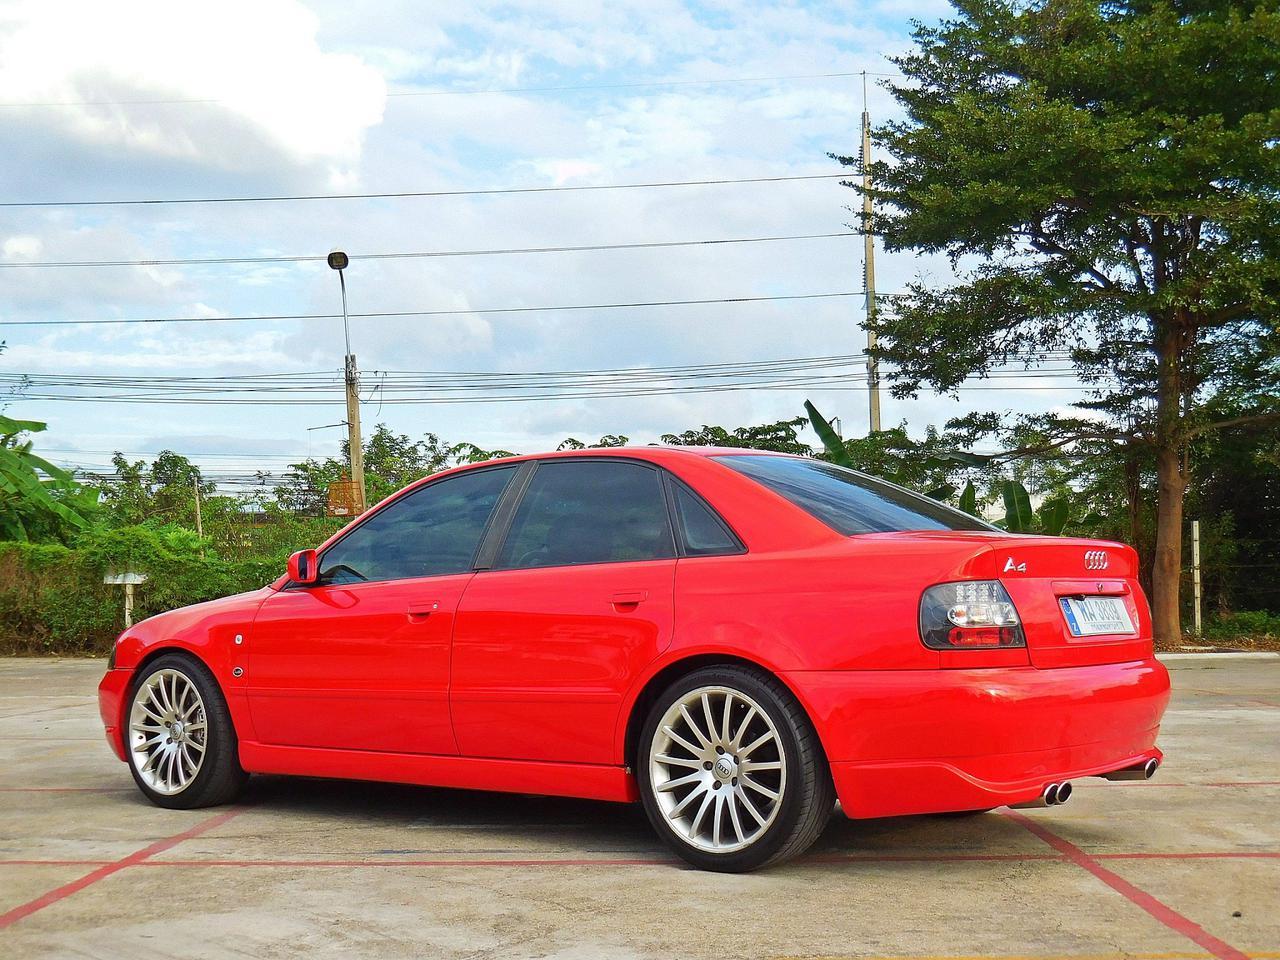 💥 AUDI ออดี้ A4 ปี 1997 เกียร์ออโต้ ไม่เคยชน สมถนะเยี่ยม ของ แต่ง เพียบ รถเก๋ง มือสอง ราคาถูก พร้อมใช้งาน รูปที่ 3